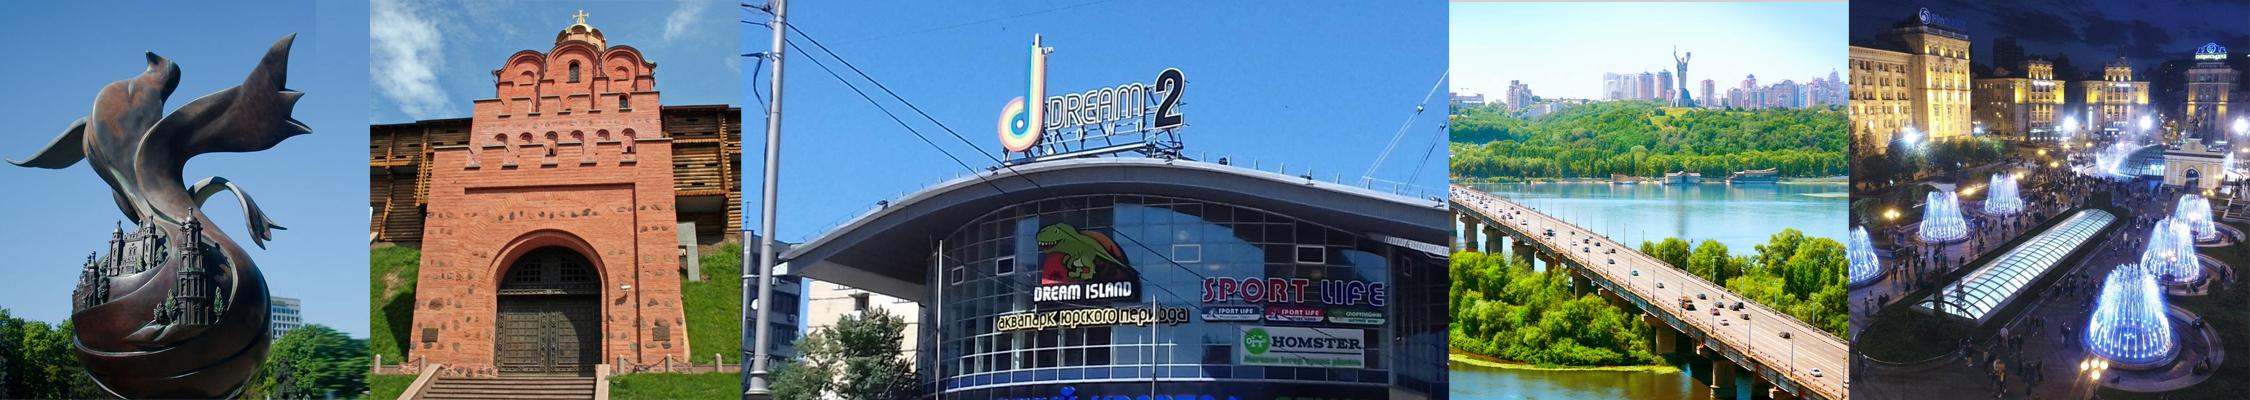 Сеть магазинов ТЦ DreamTown 2